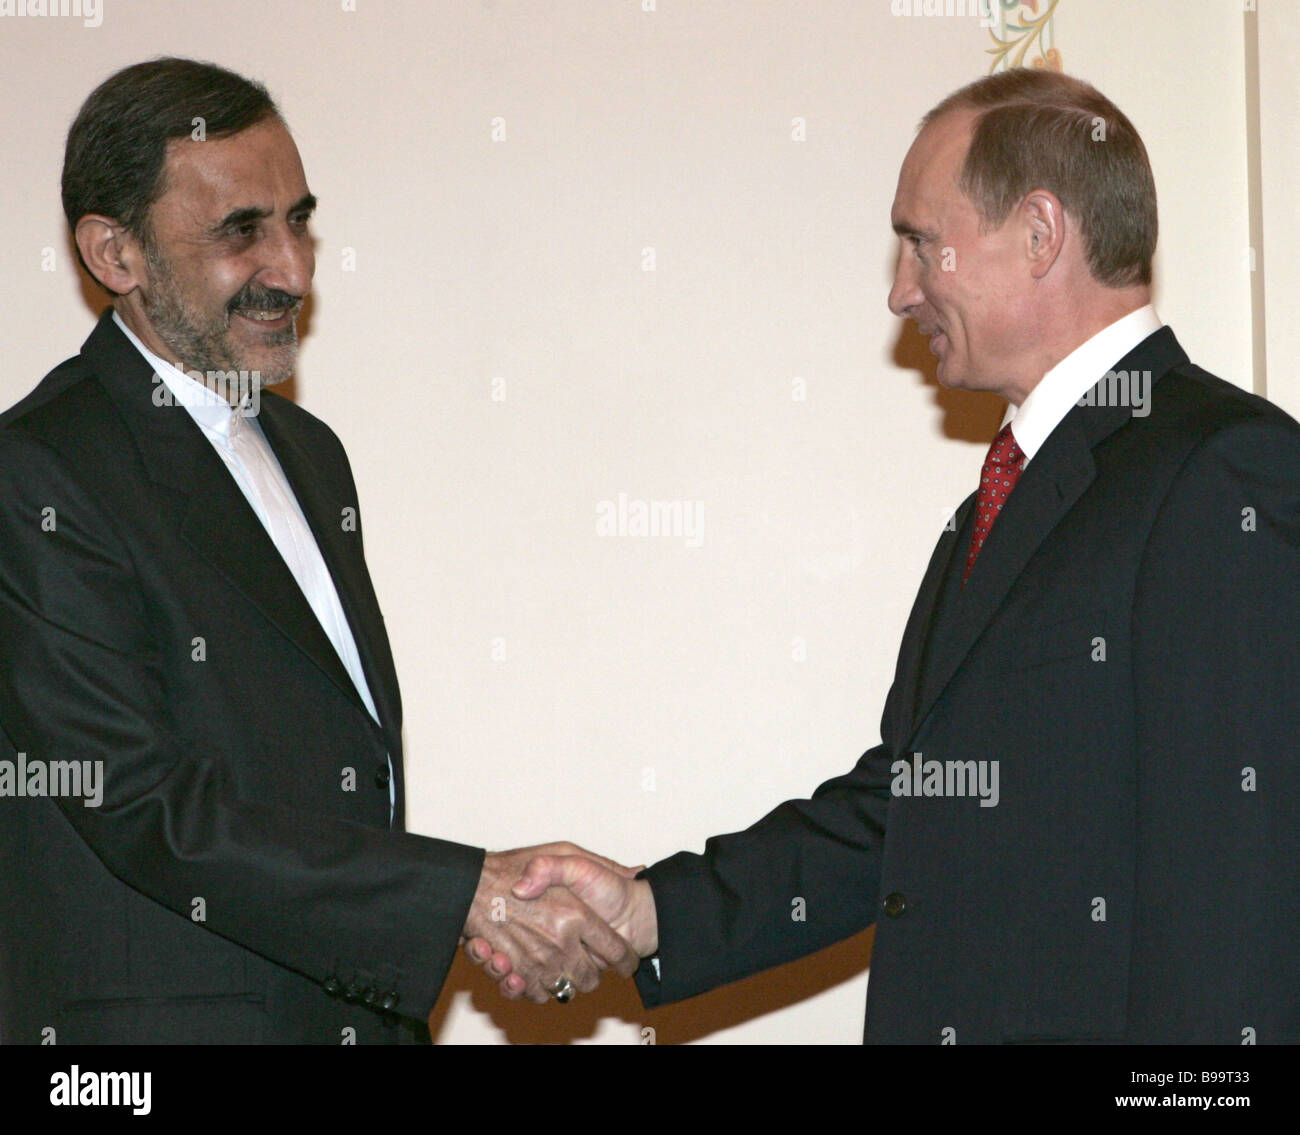 Ali Akbar Velayati foreign policy counselor of the Supreme Leader of Iran and Russian President Vladimir Putin left - Stock Image